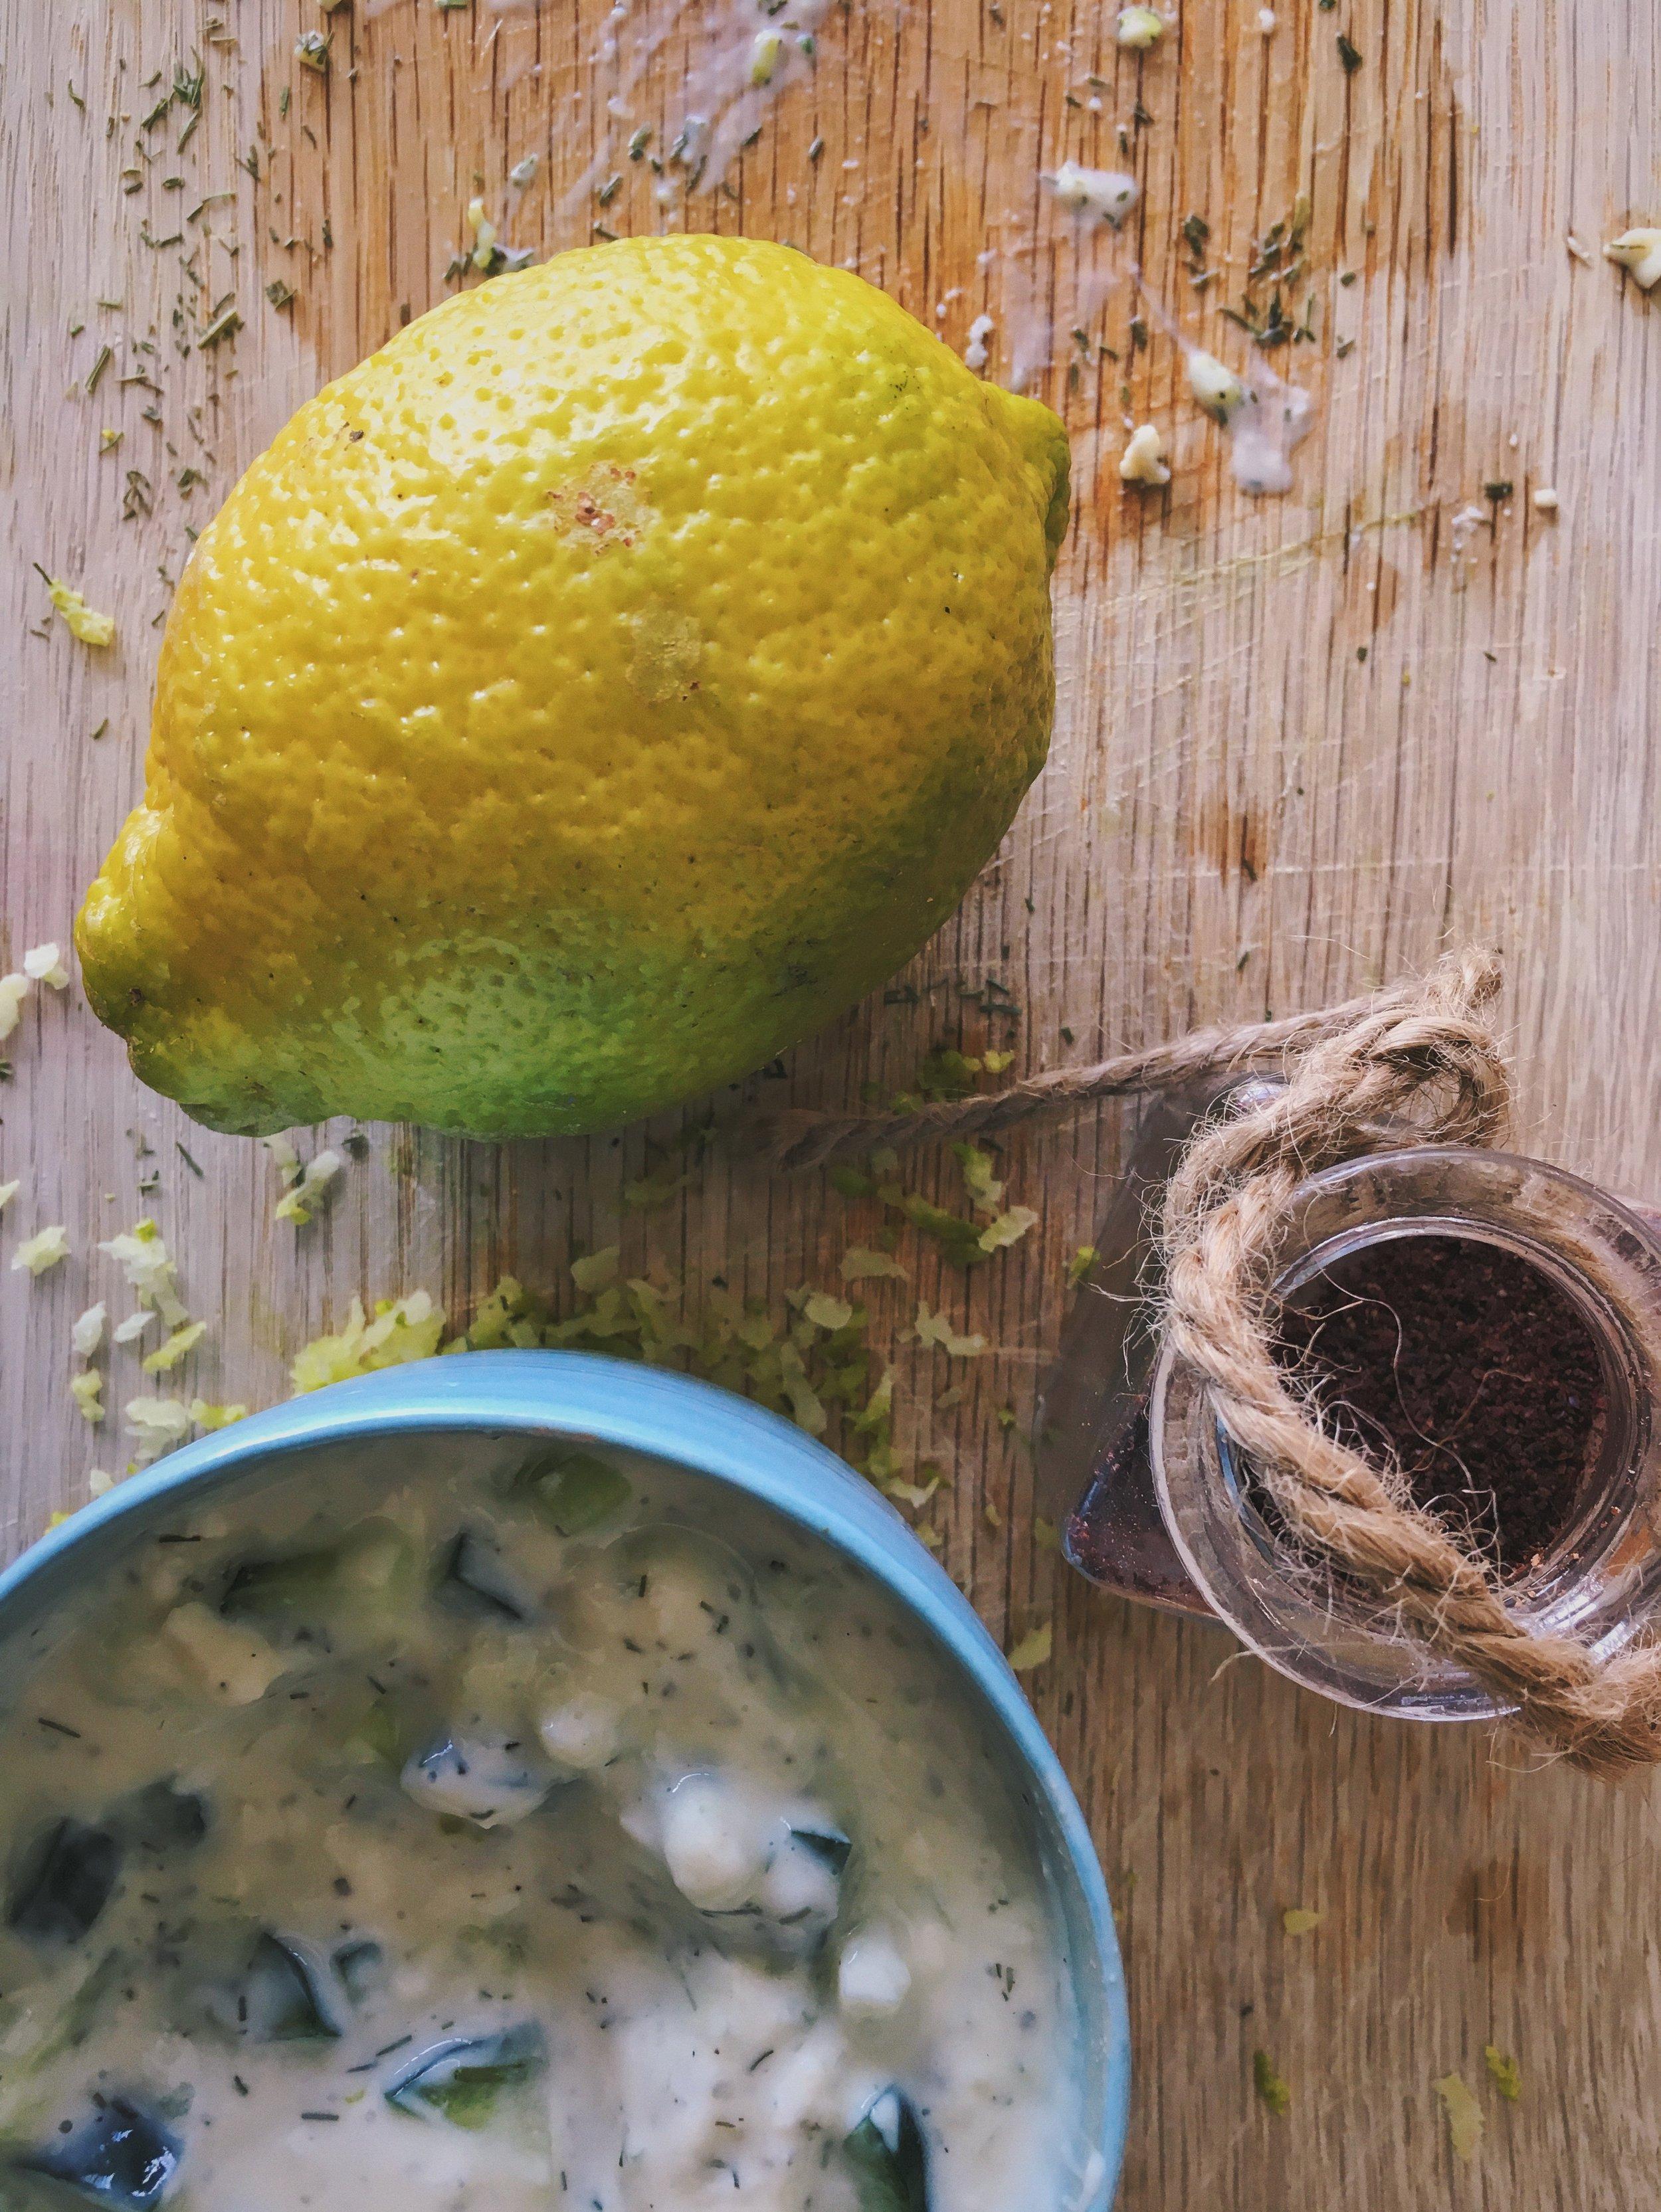 vegan tzatziki dip with lemon and za'atar spices